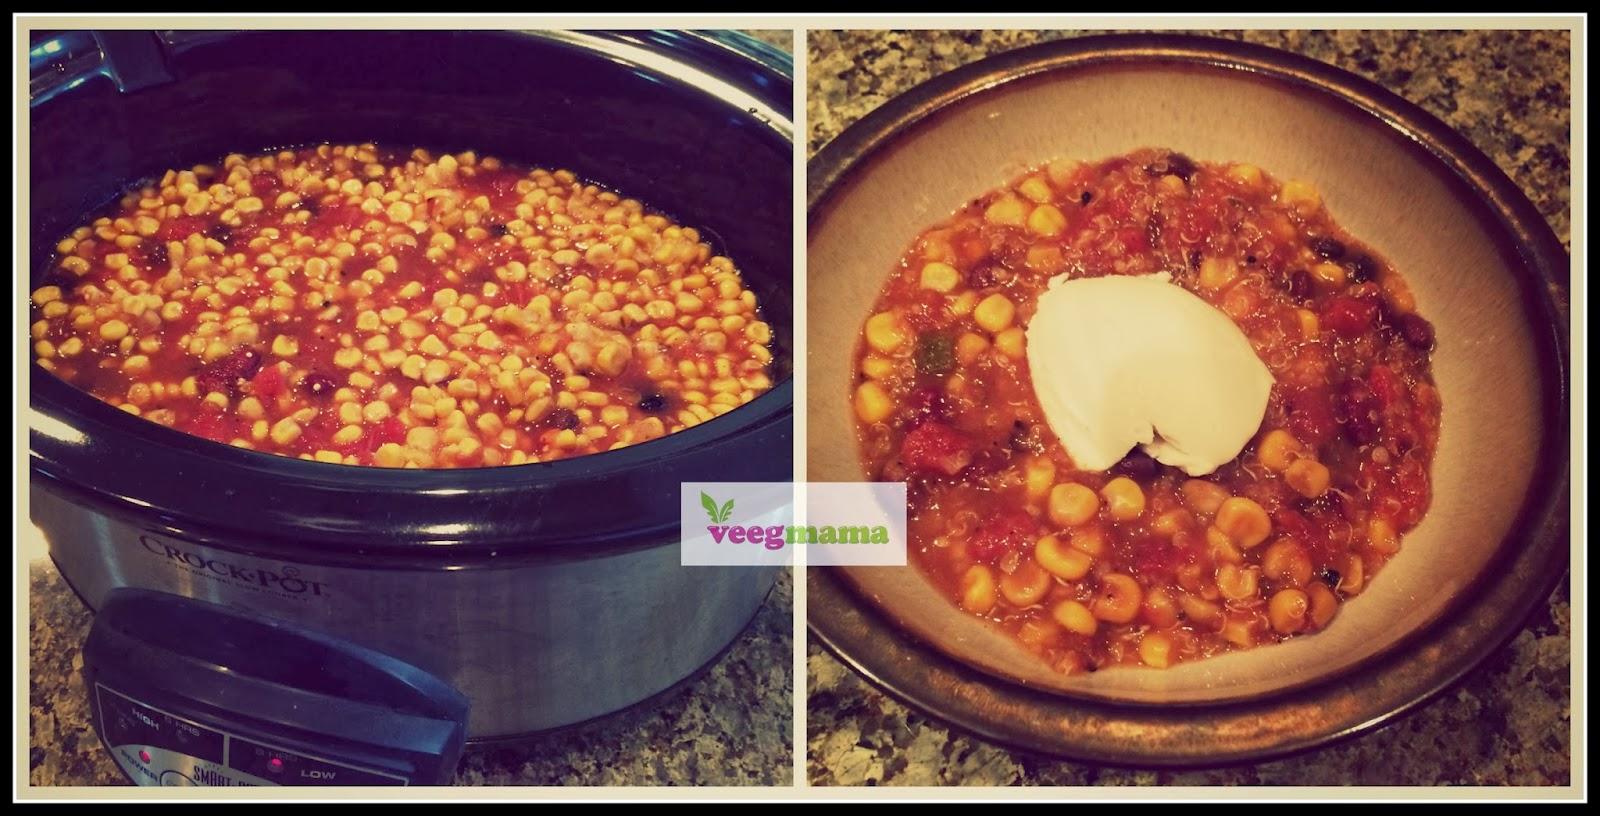 VeegMama's vegan chili recipe